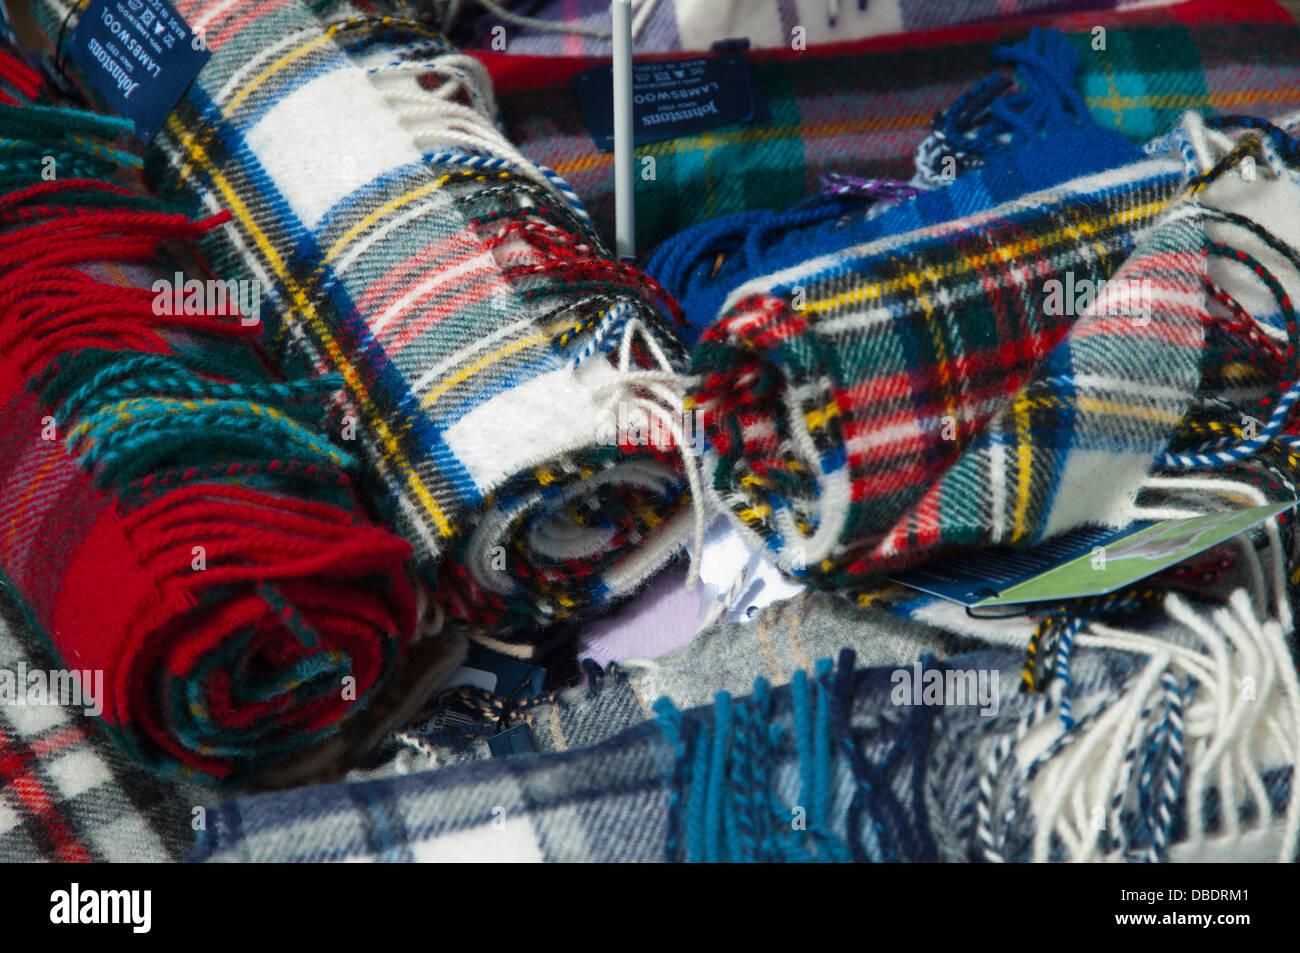 Product Of Scotland Stockfotos & Product Of Scotland Bilder - Alamy